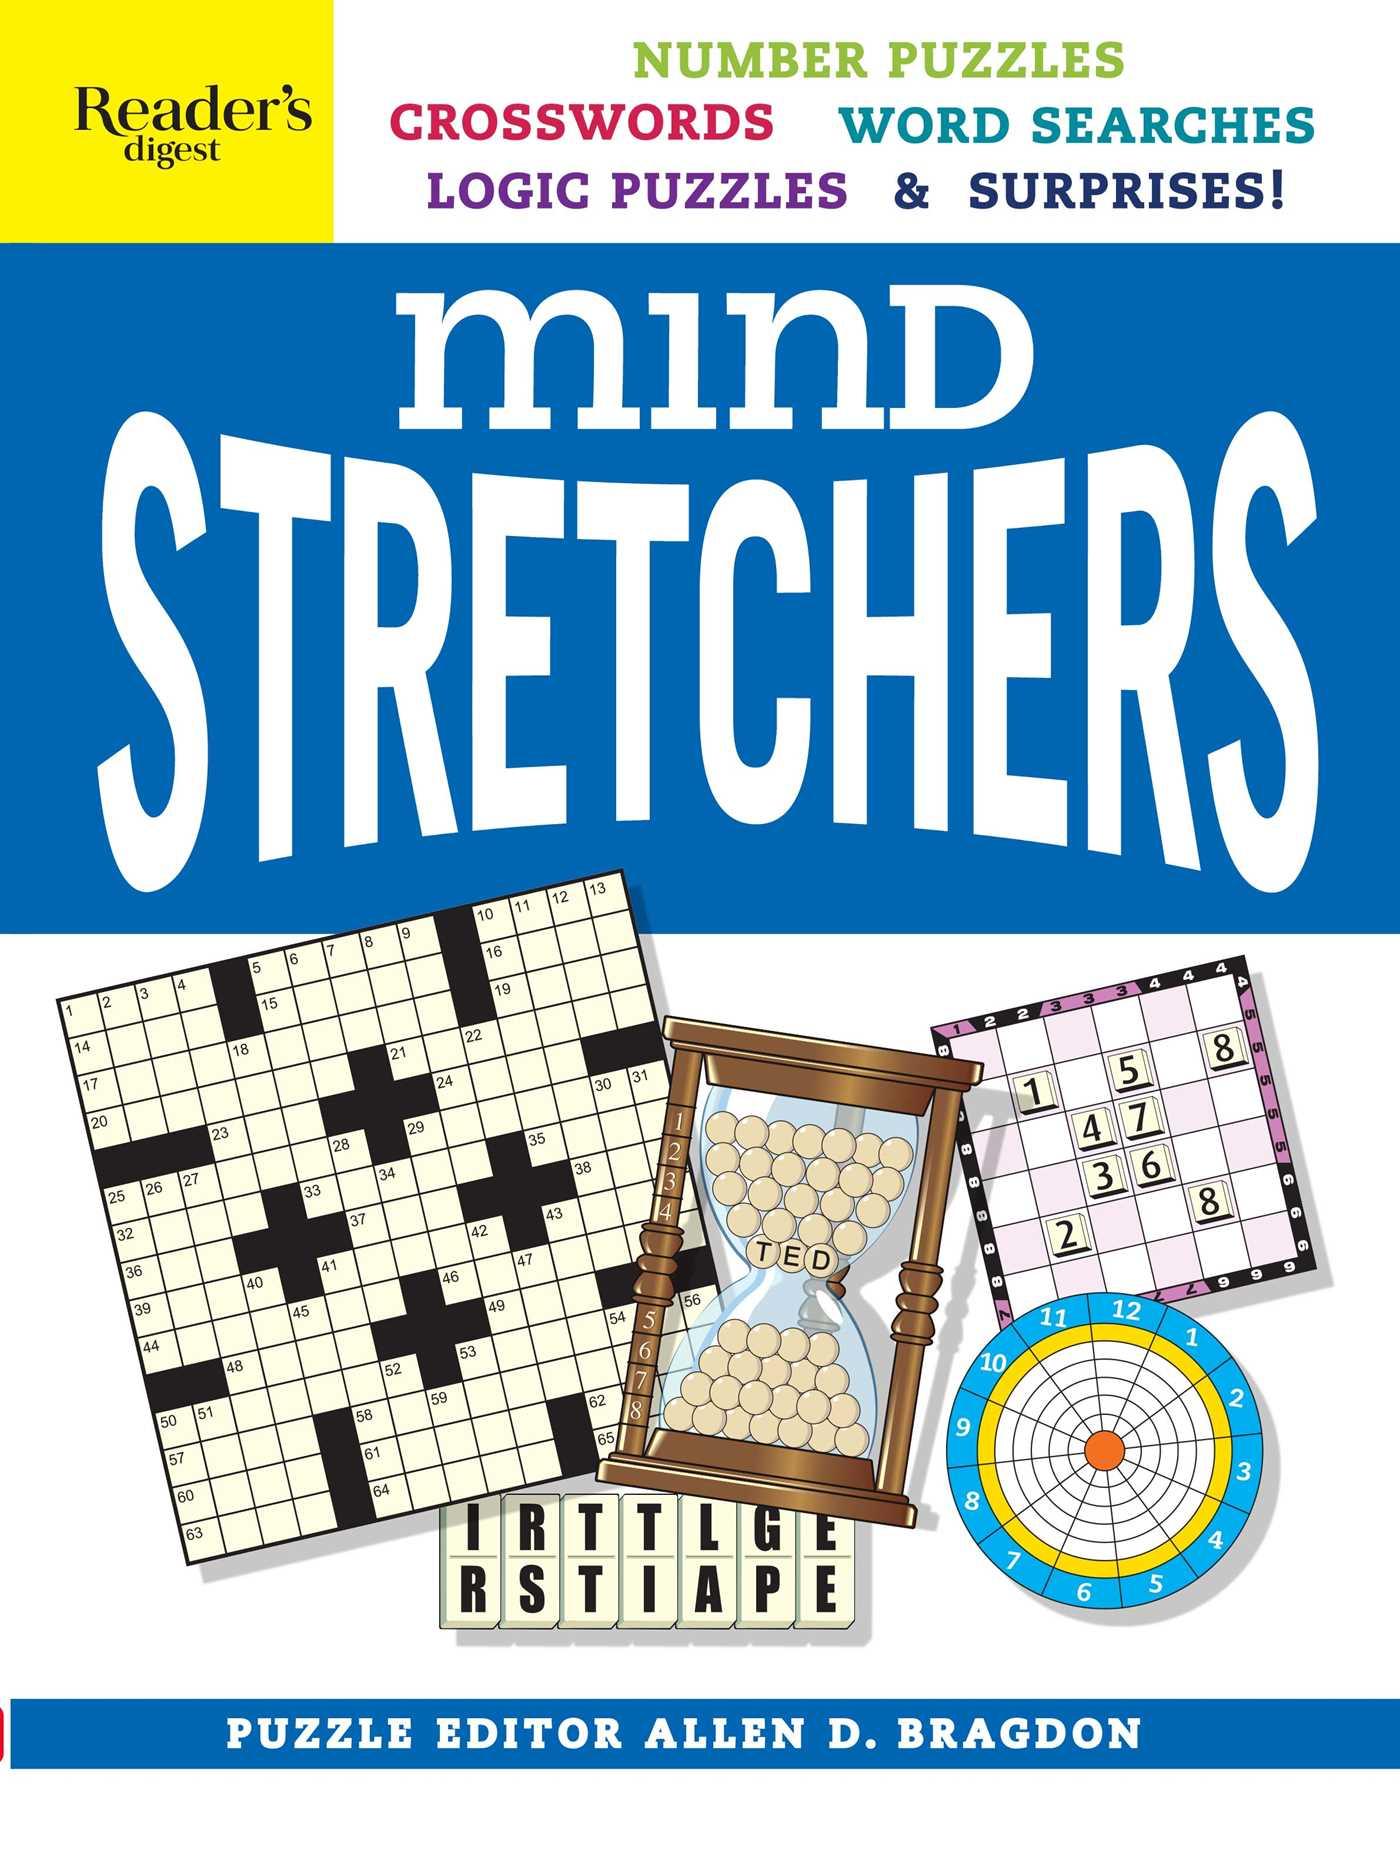 Readers Digest Mind Stretchers Puzzle Book By Allen D Logic Diagram Crossword Clue Number Puzzles Crosswords Word Searches Surprises